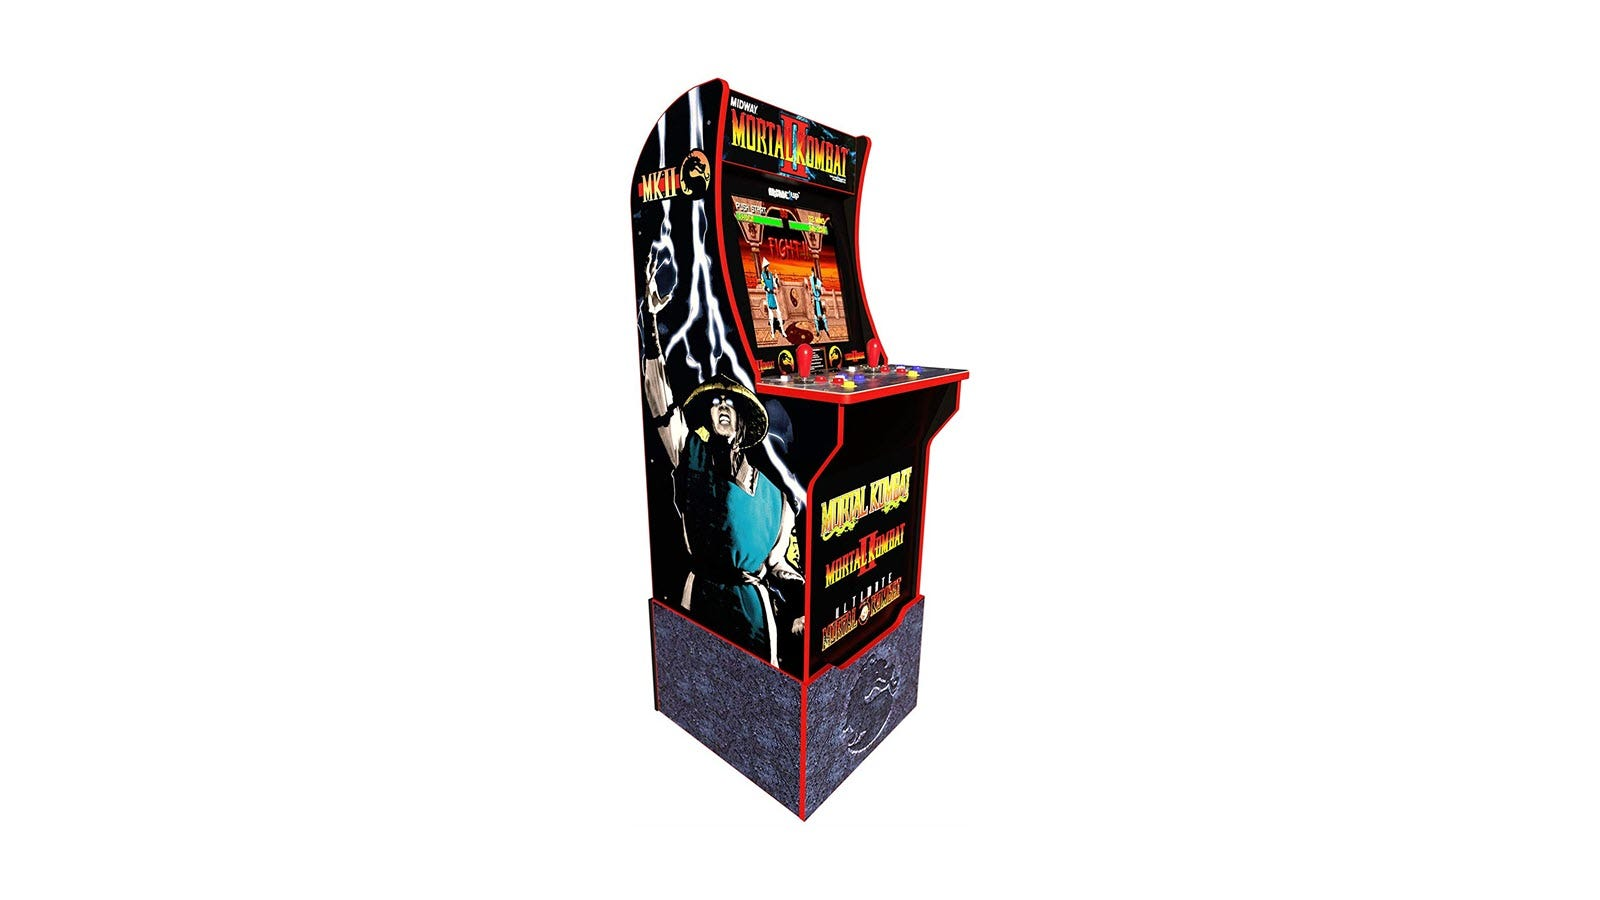 The Mortal Kombat arcade on a custom riser with the Mortal Kombat logo over a stone pattern.